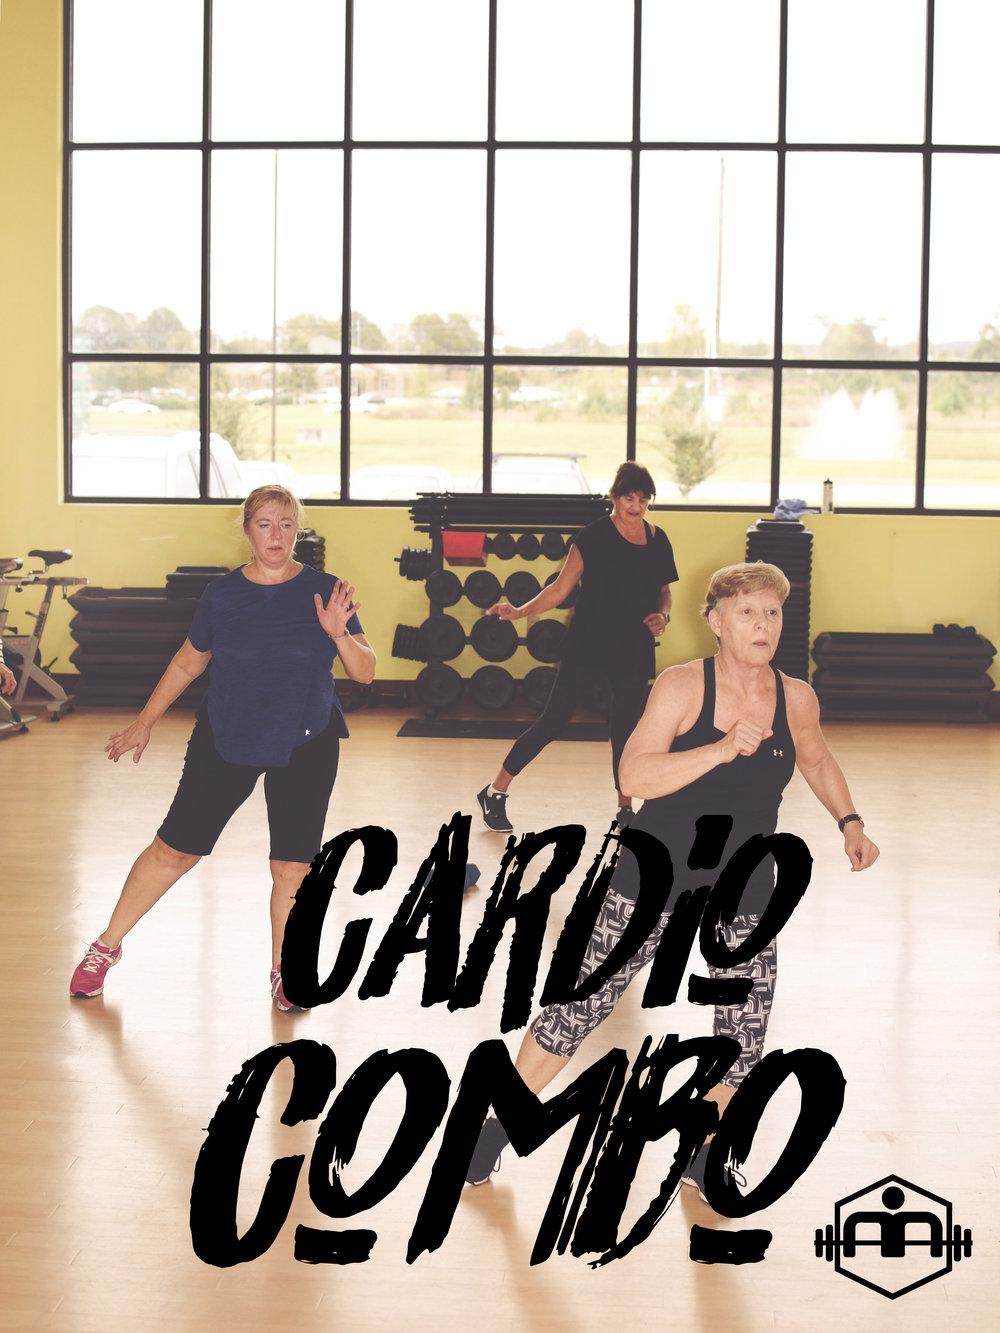 Cardiocombo1cover.jpg